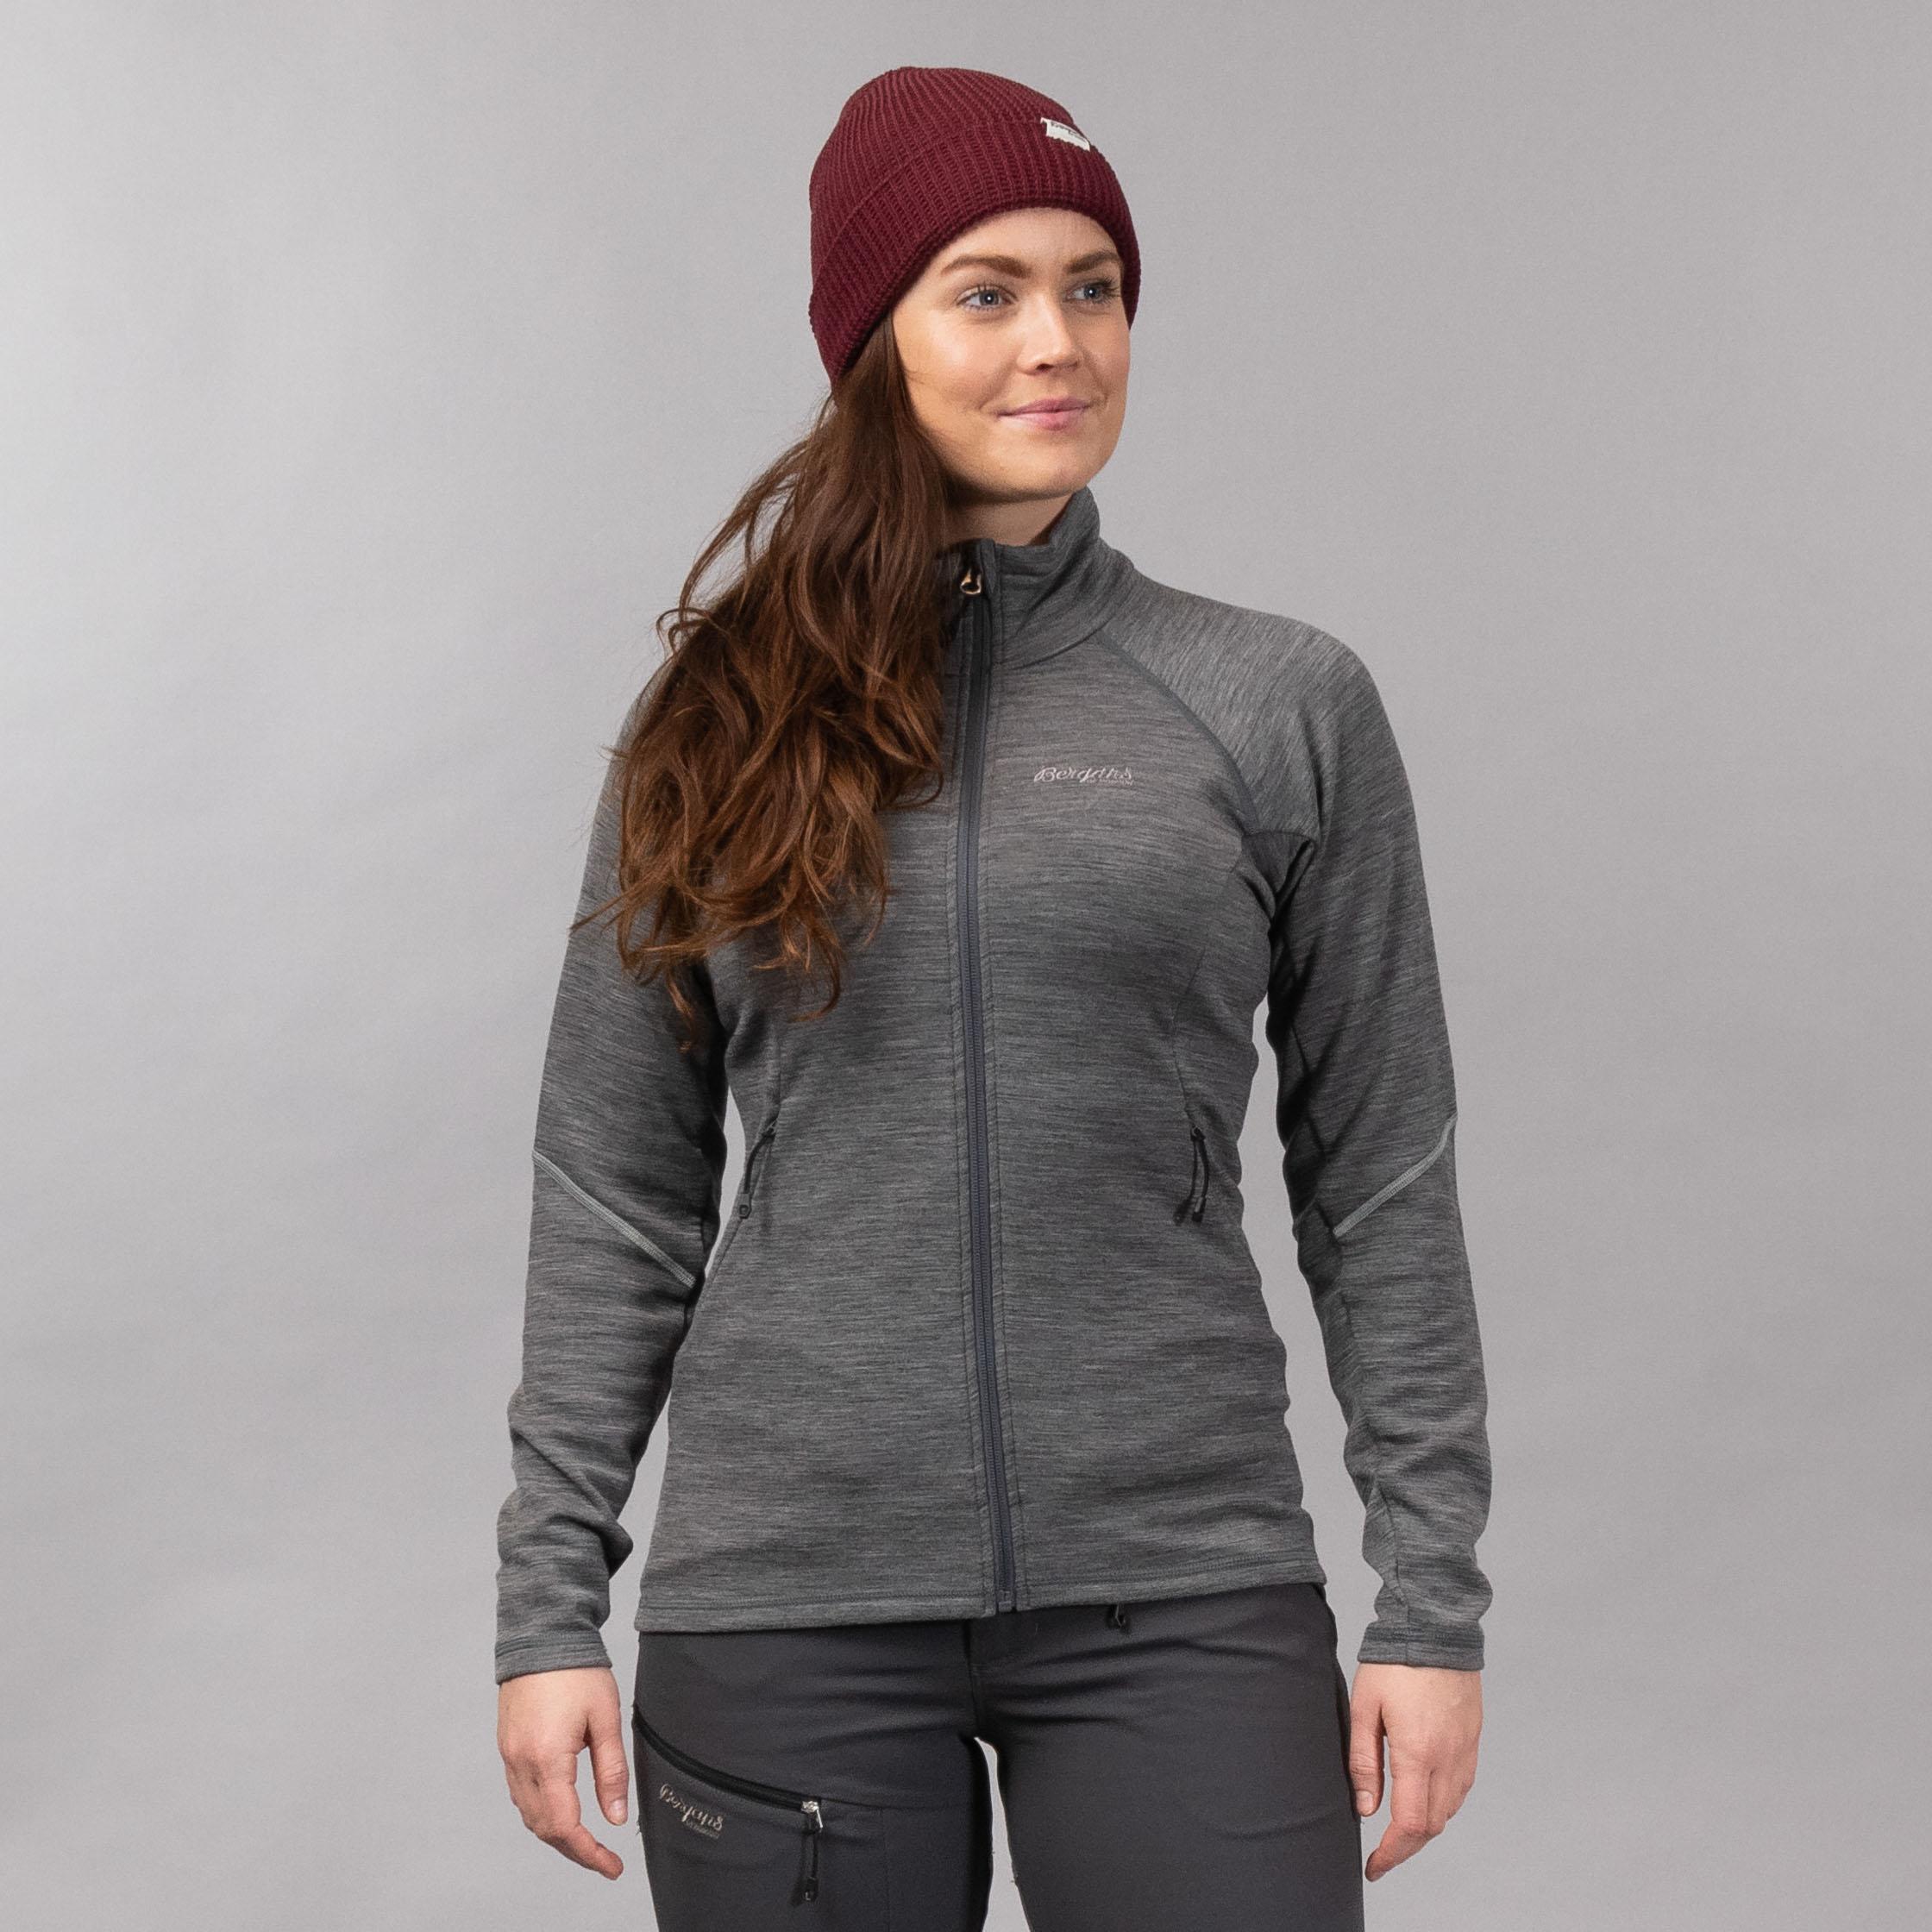 Rabot 365 Wool W Jacket